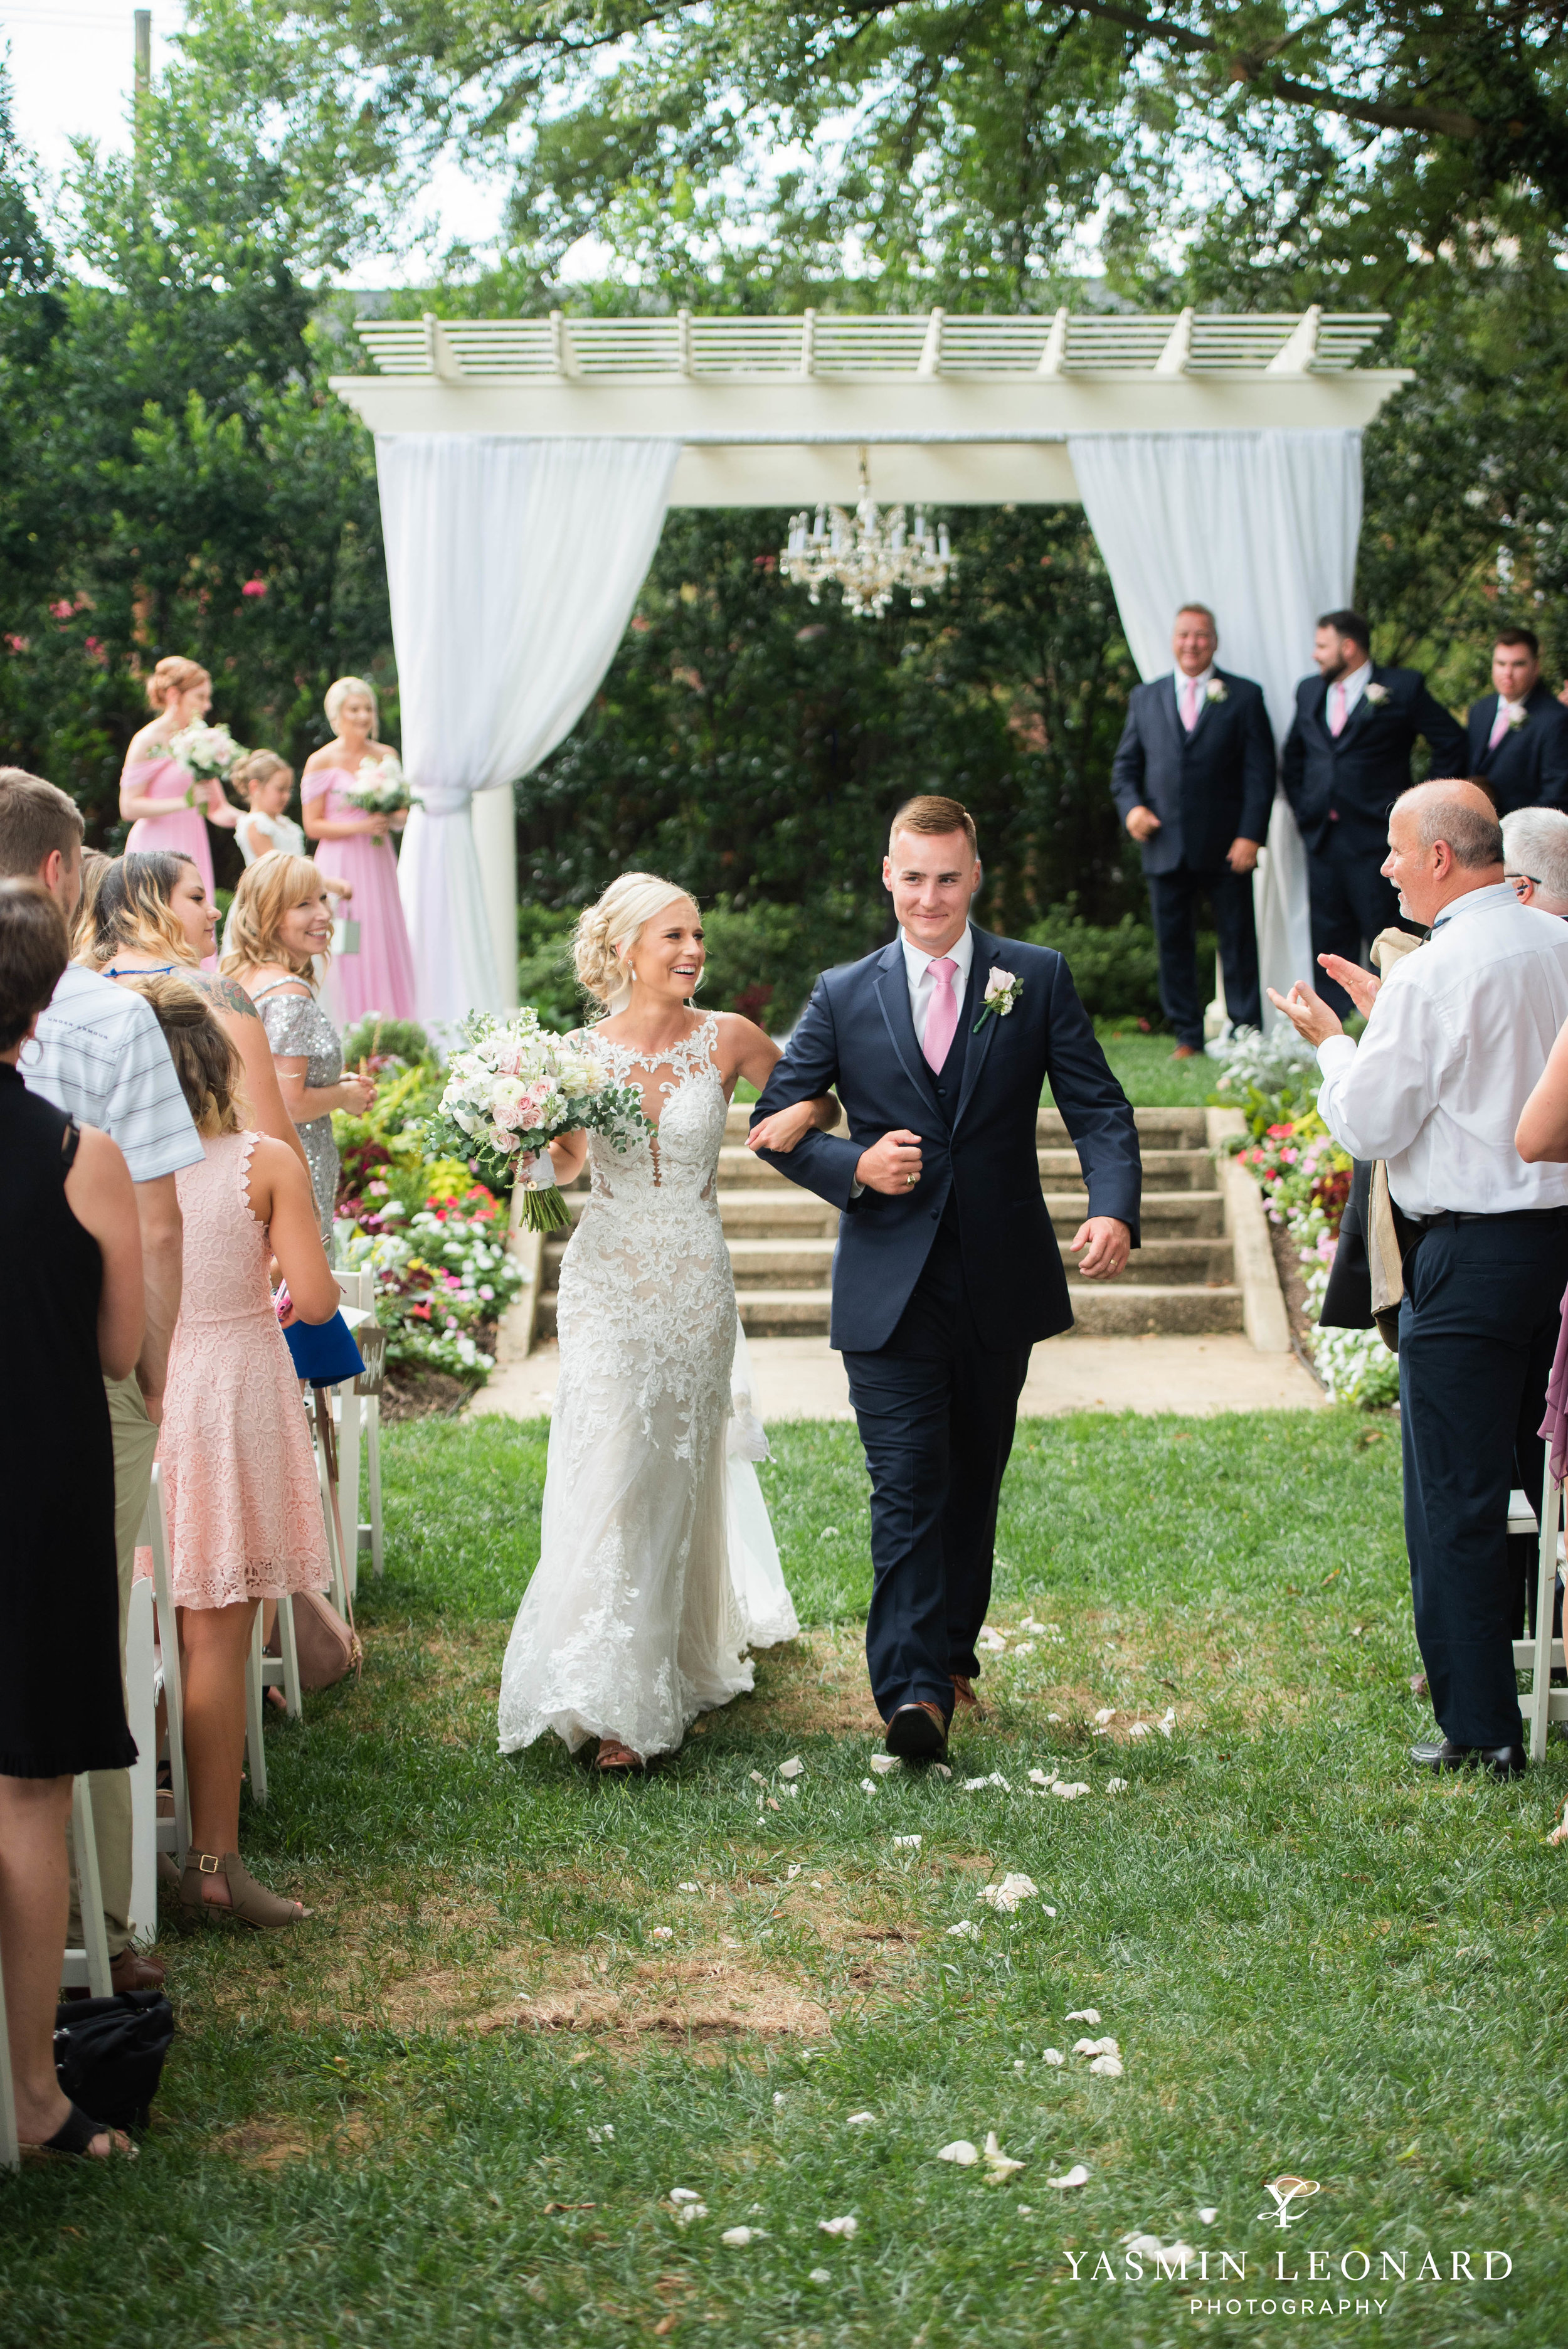 Separk Mansion - NC Weddings - Gastonia Wedding - NC Wedding Venues - Pink and Blue Wedding Ideas - Pink Bridesmaid Dresses - Yasmin Leonard Photography-25.jpg